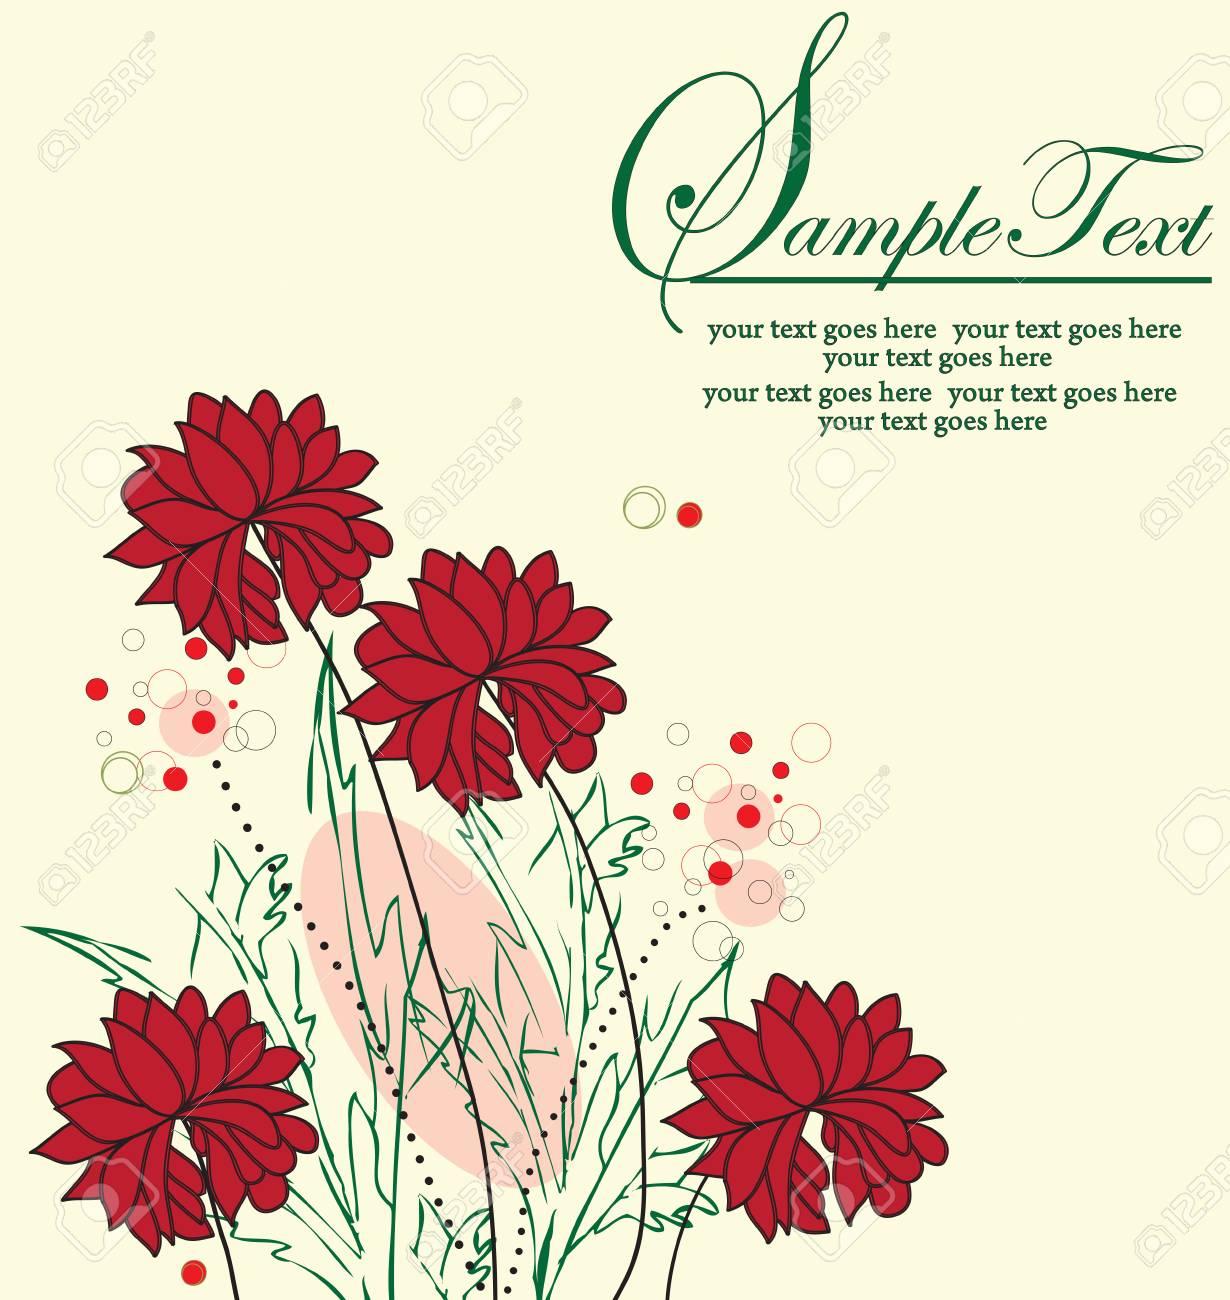 Vintage Wedding Invitation Card With Elegant Retro Floral Design ...